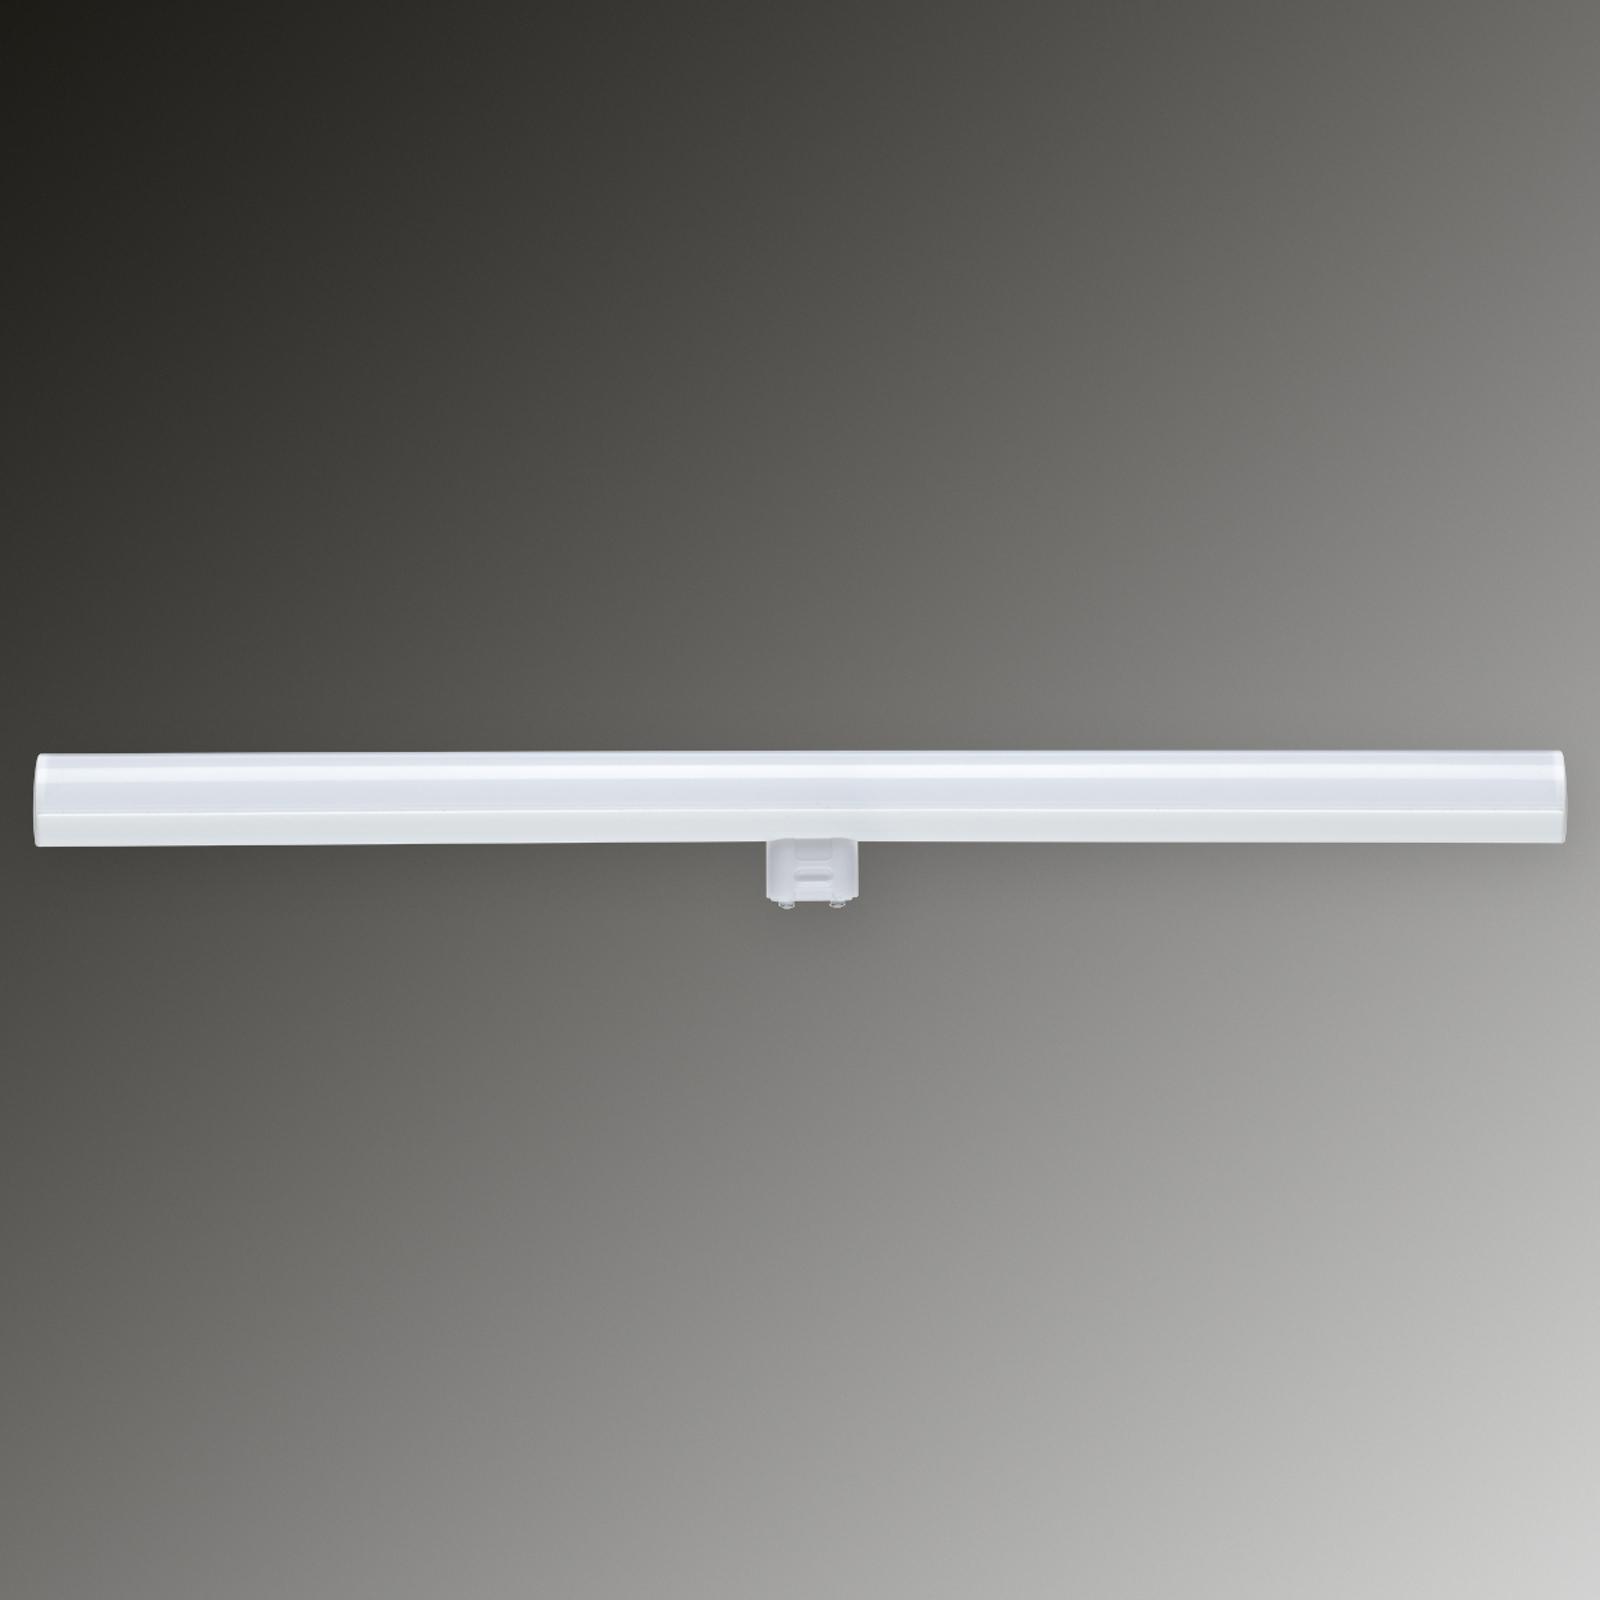 S14d 6,5W 827 lampa liniowa LED, 1 trzonek 500 mm